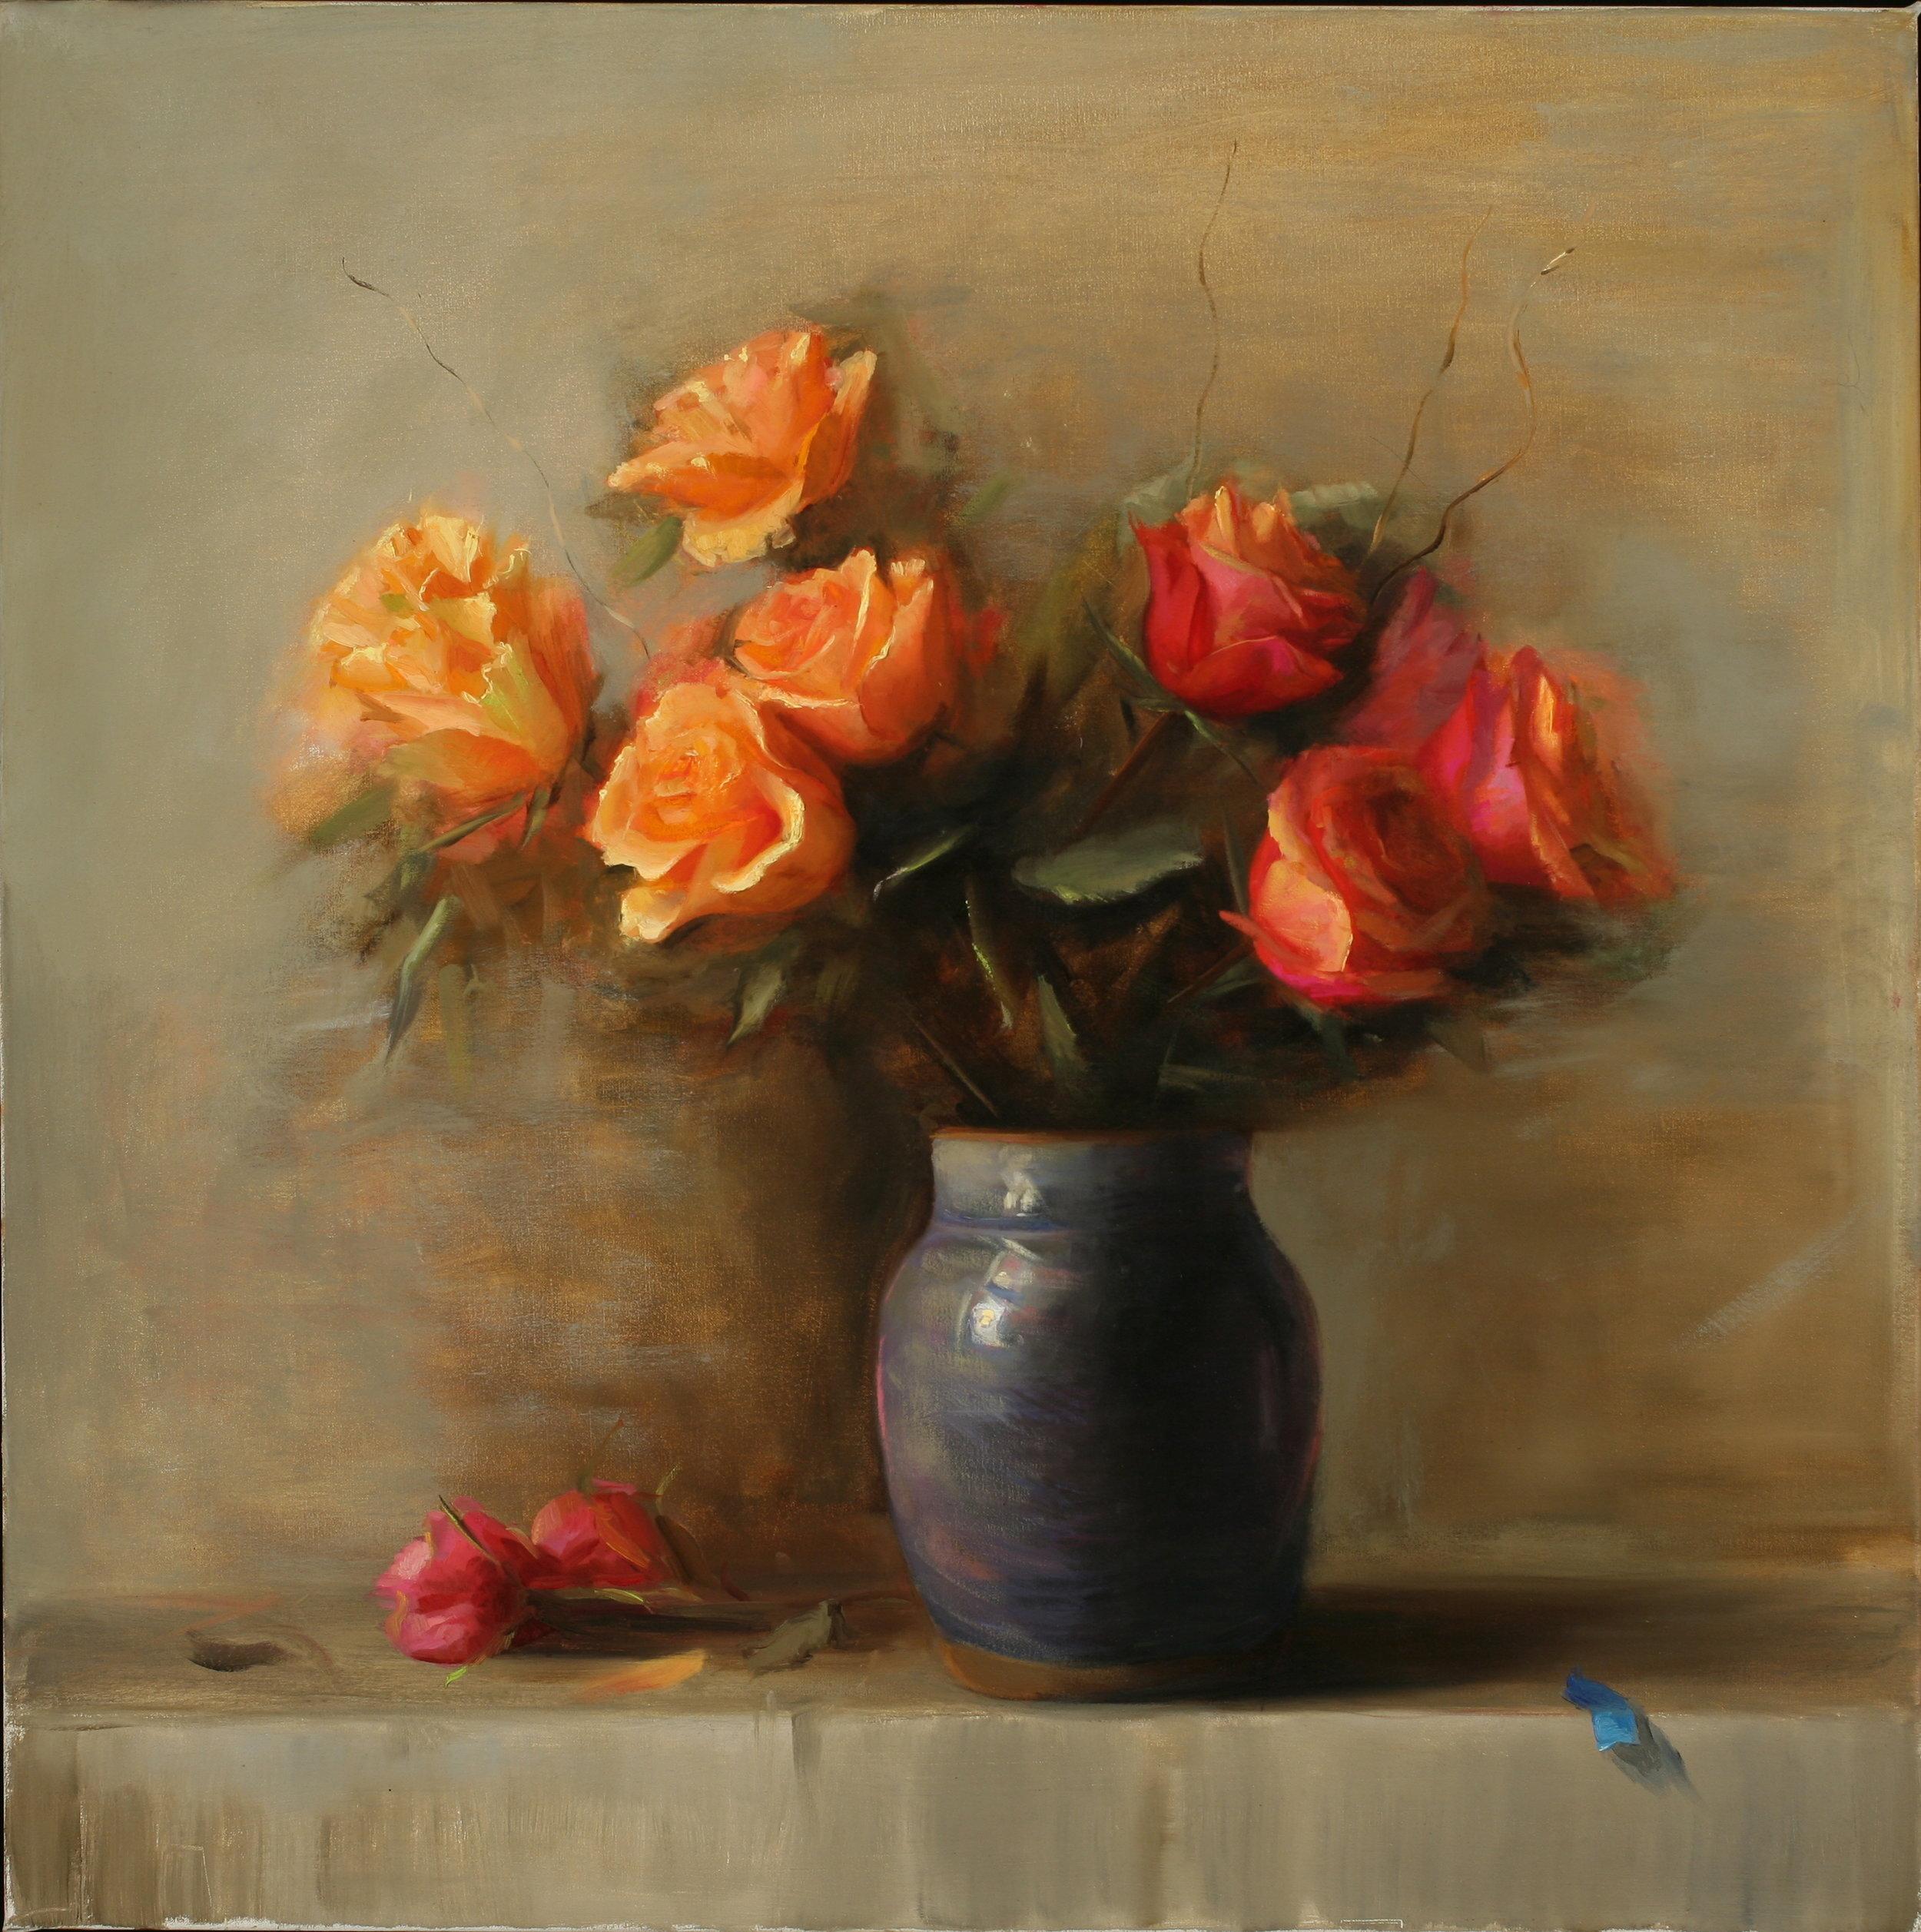 Roses+2015+oil+on+canvas - Copy.jpg